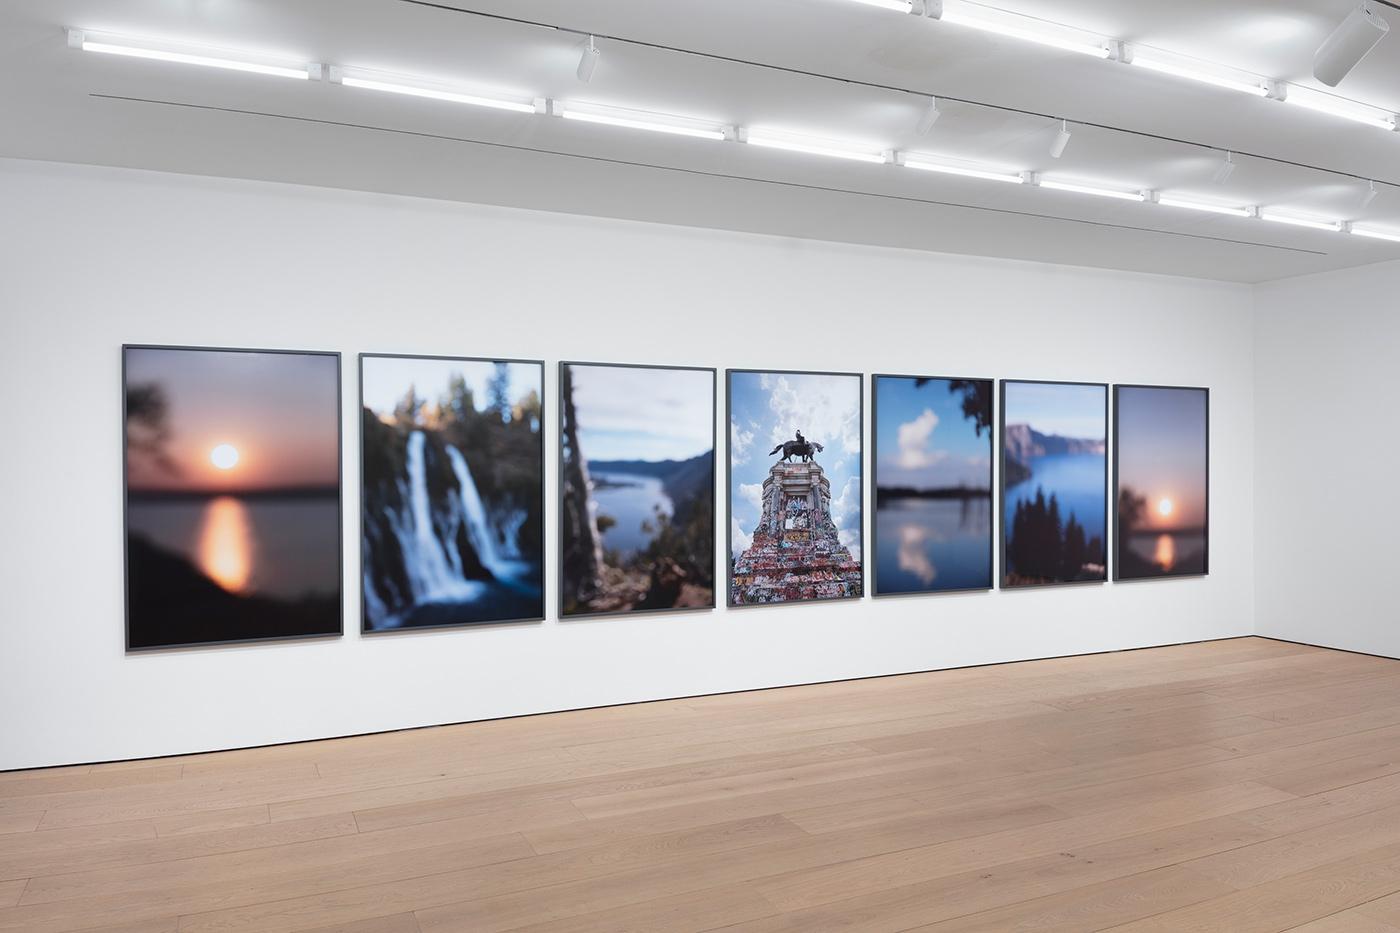 CATHERINE OPIE, Untitled (monument/monumental), 2020